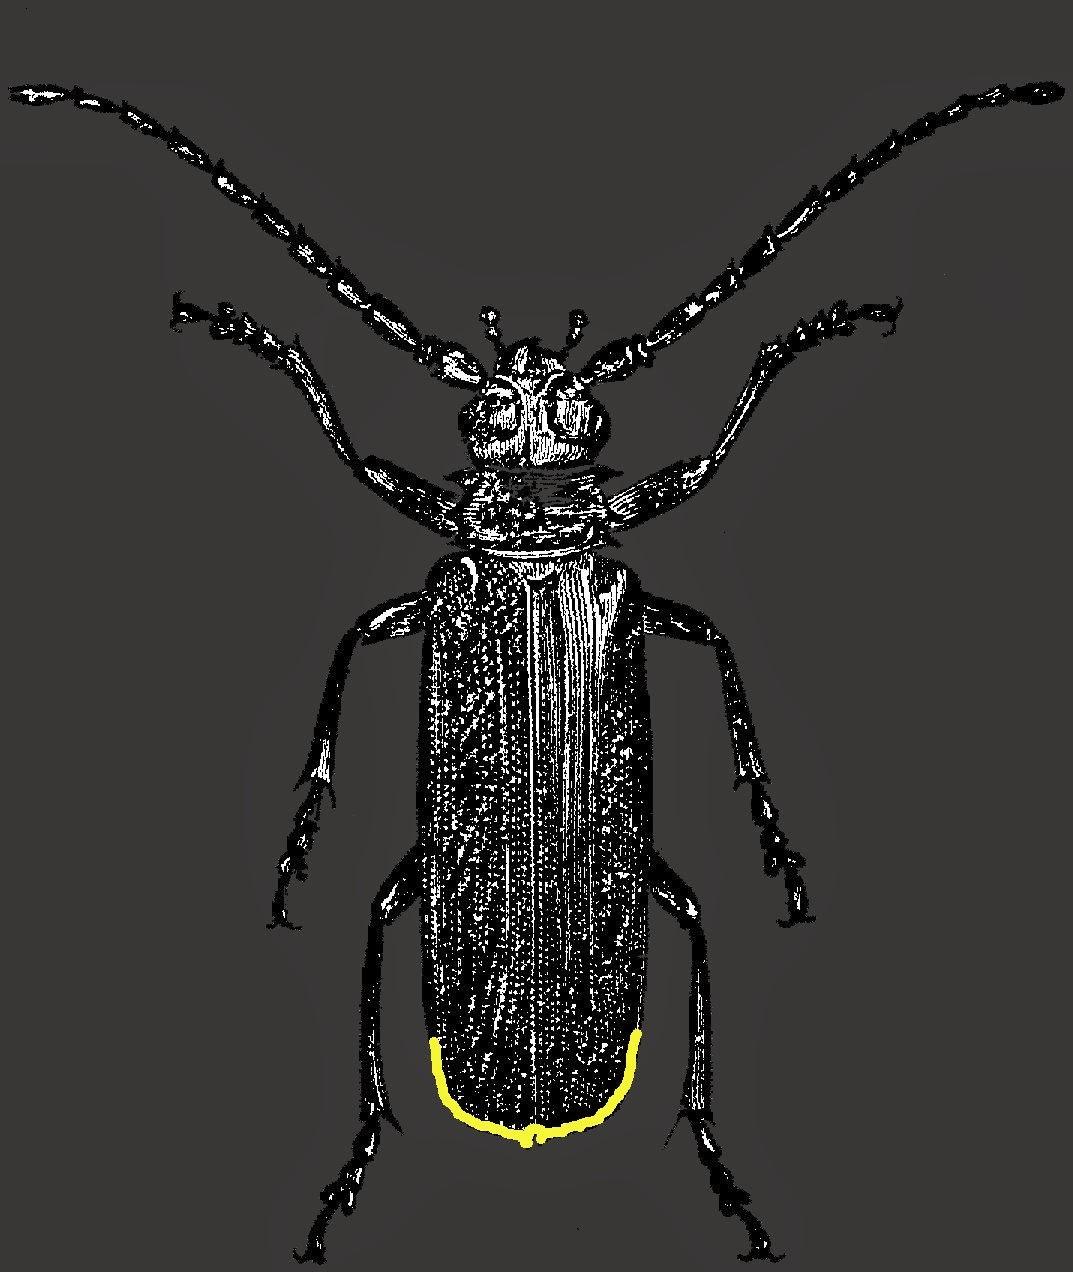 firefly, lightning bug, glow worm, insect, bug, lampyridae